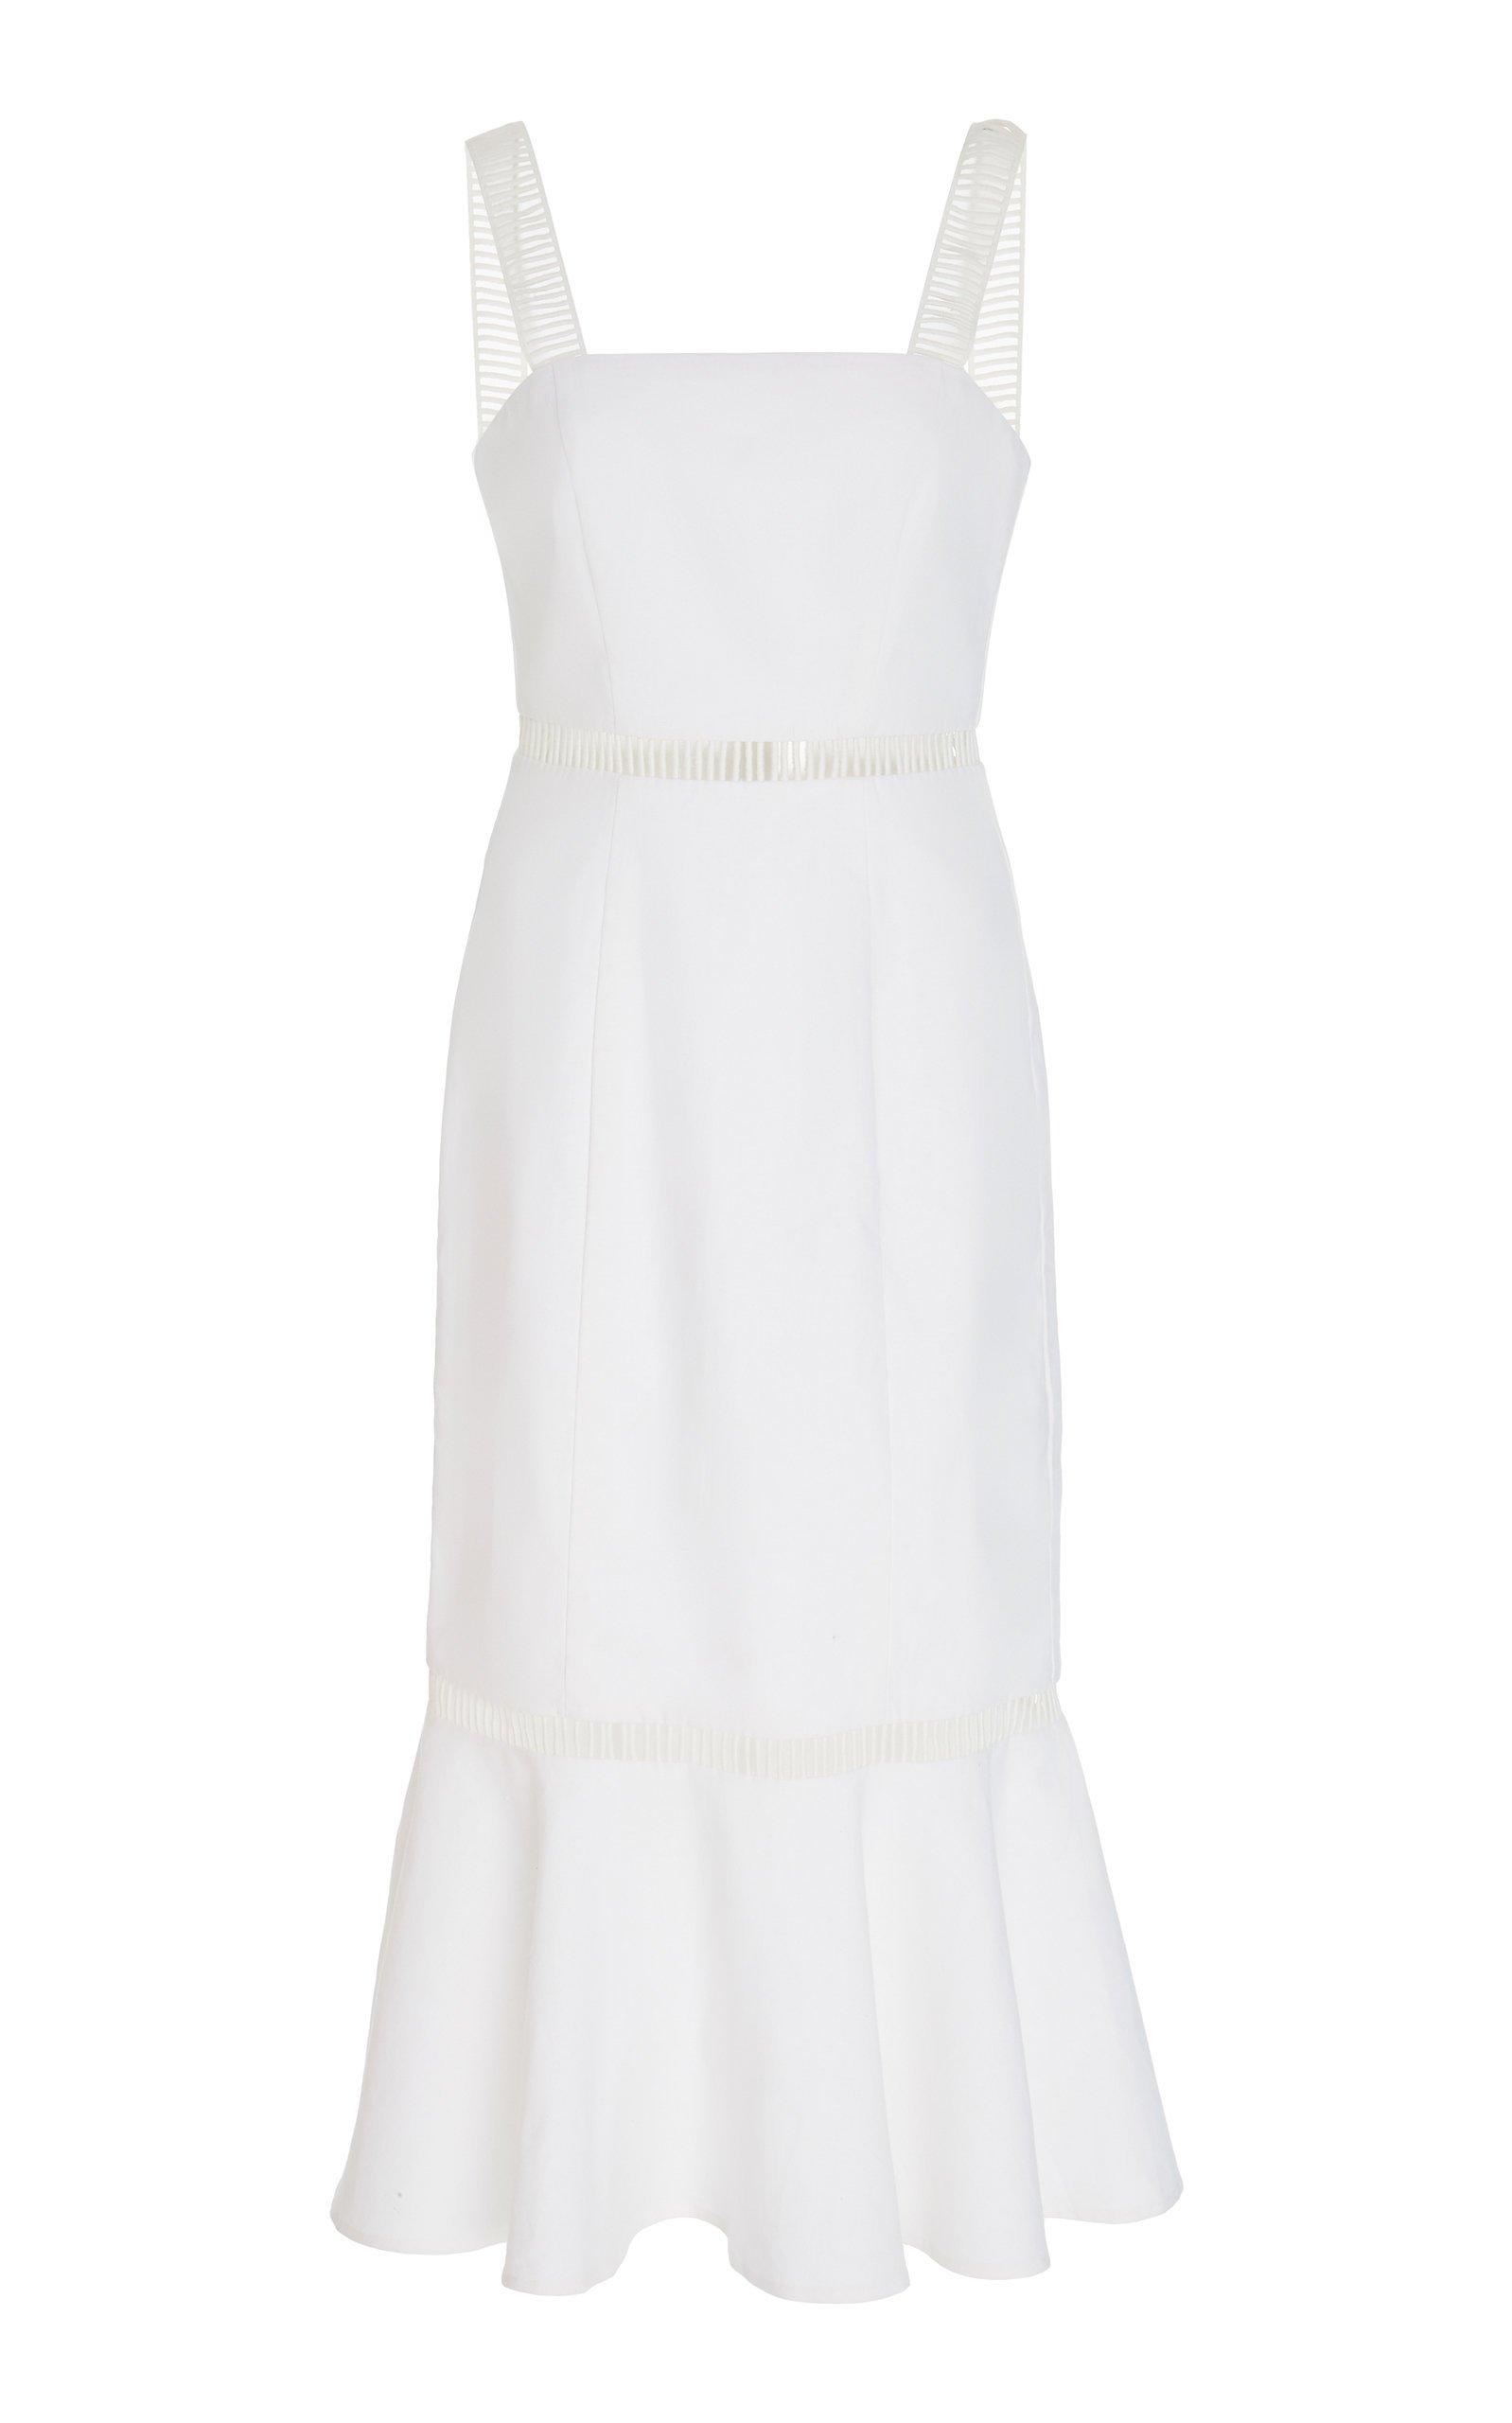 Staud Lychee Midi Dress Size: 00